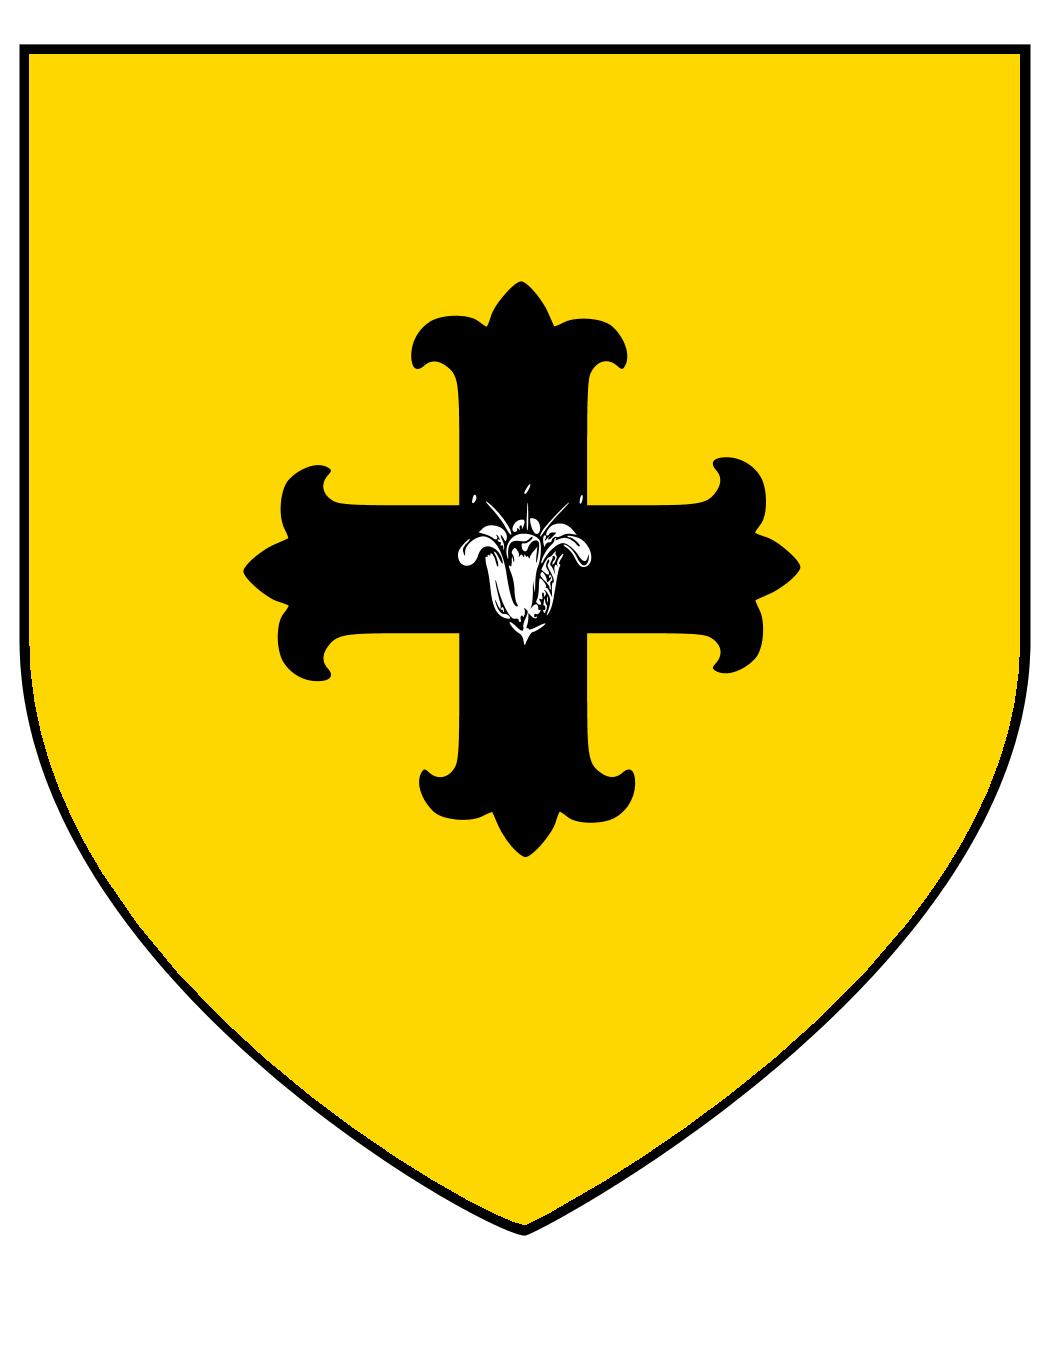 coat_of_arms_Werner_of_Helmstedt.png